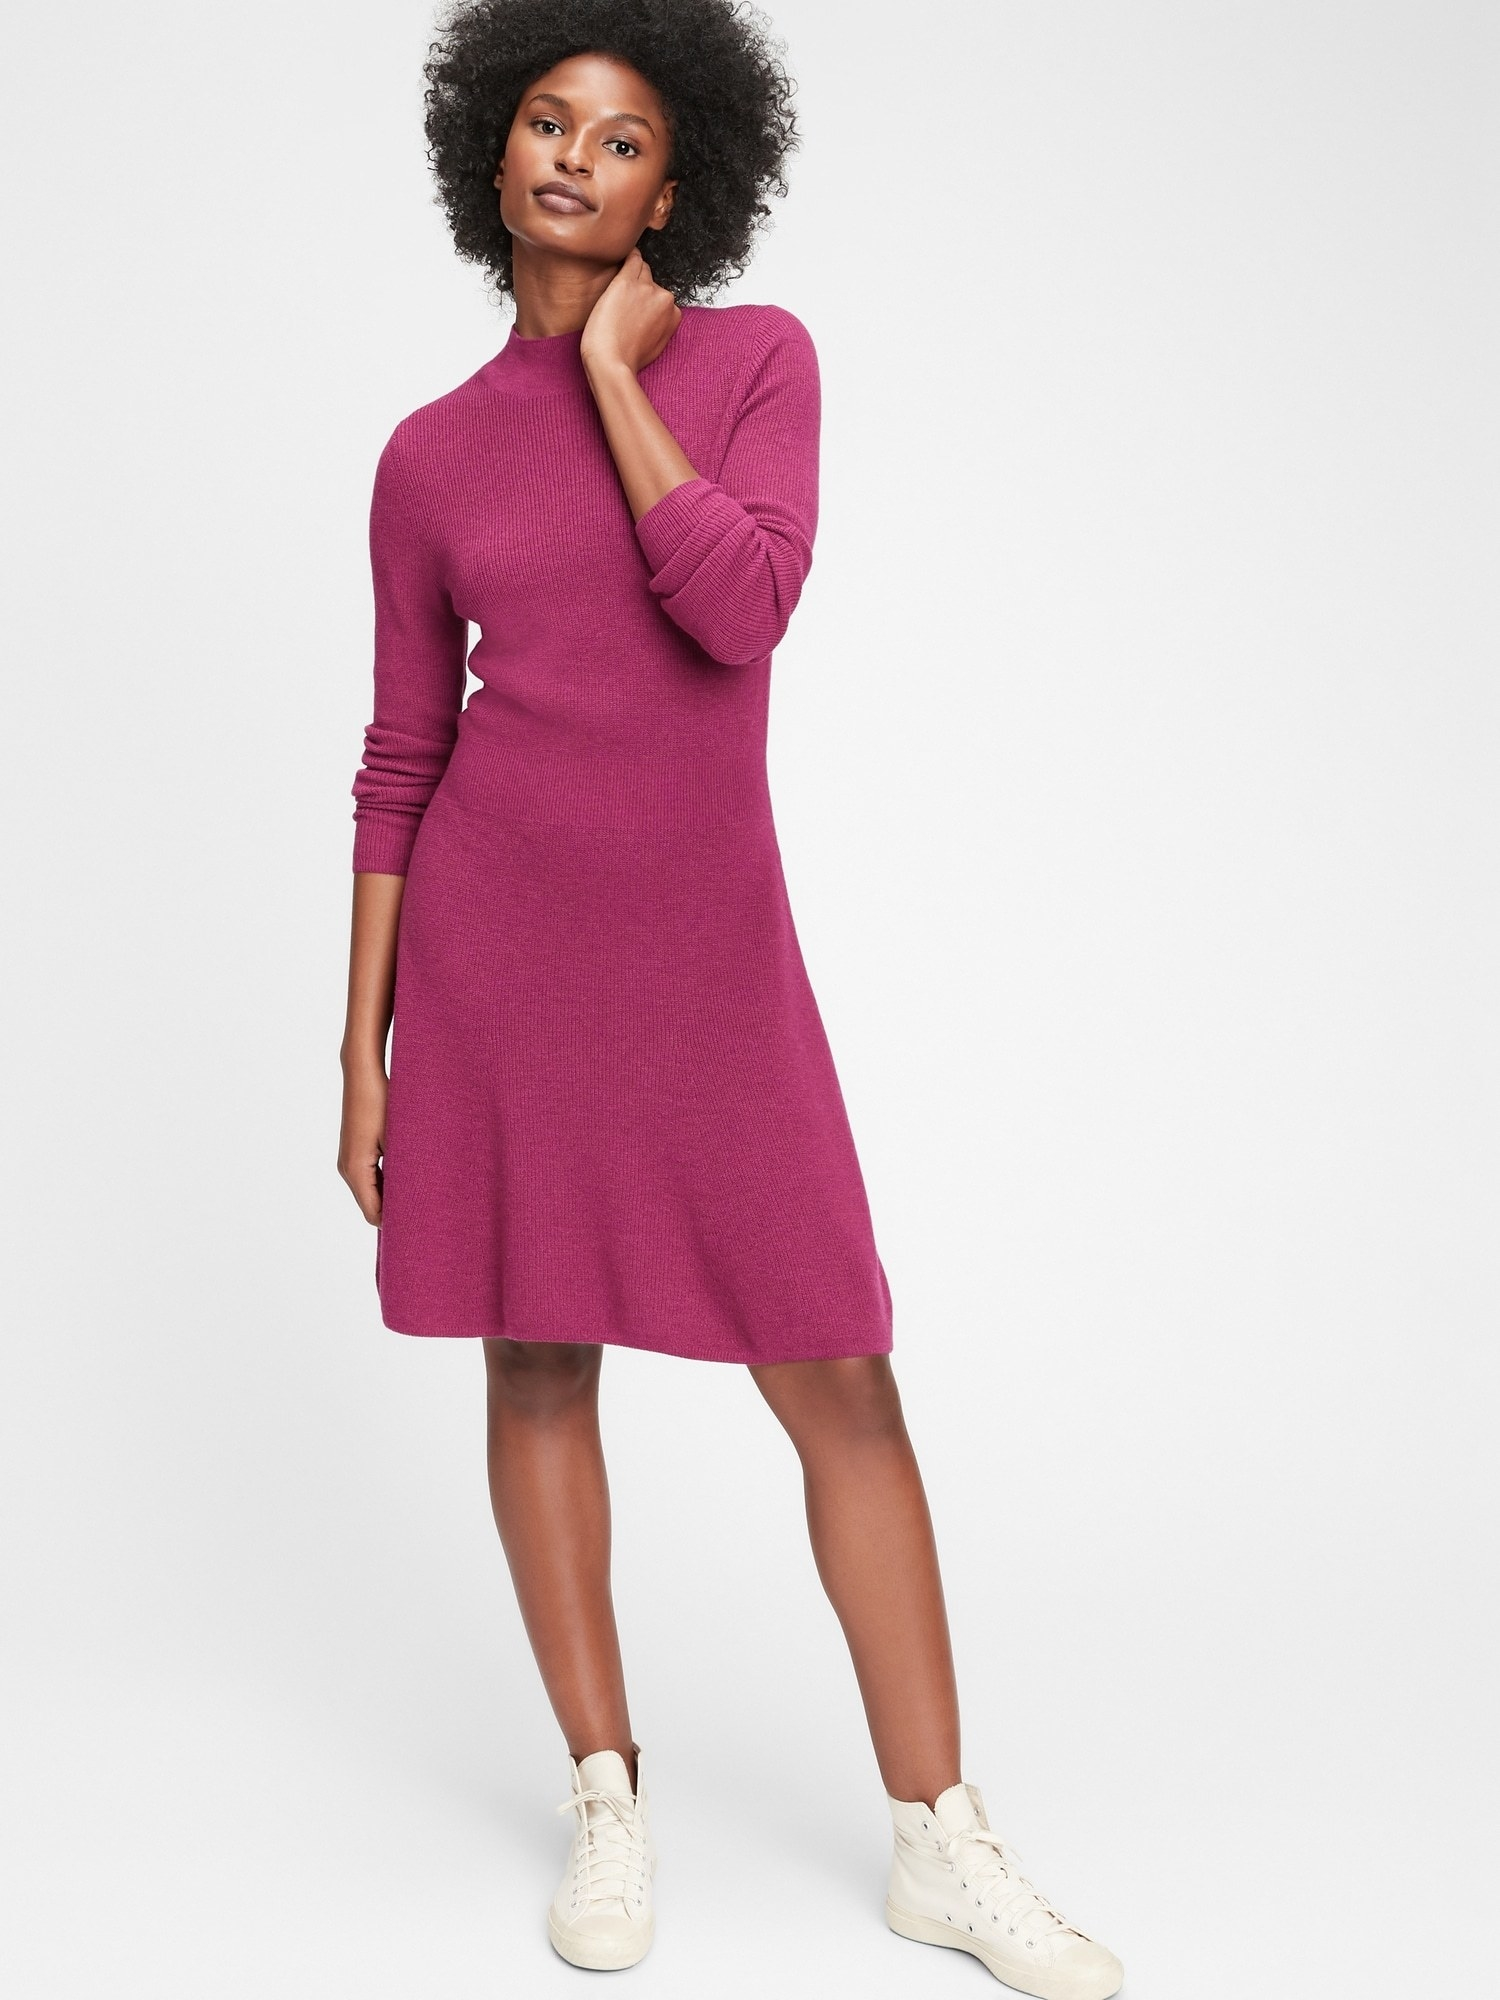 Model wearing the knee-length long sleeved dress in pink